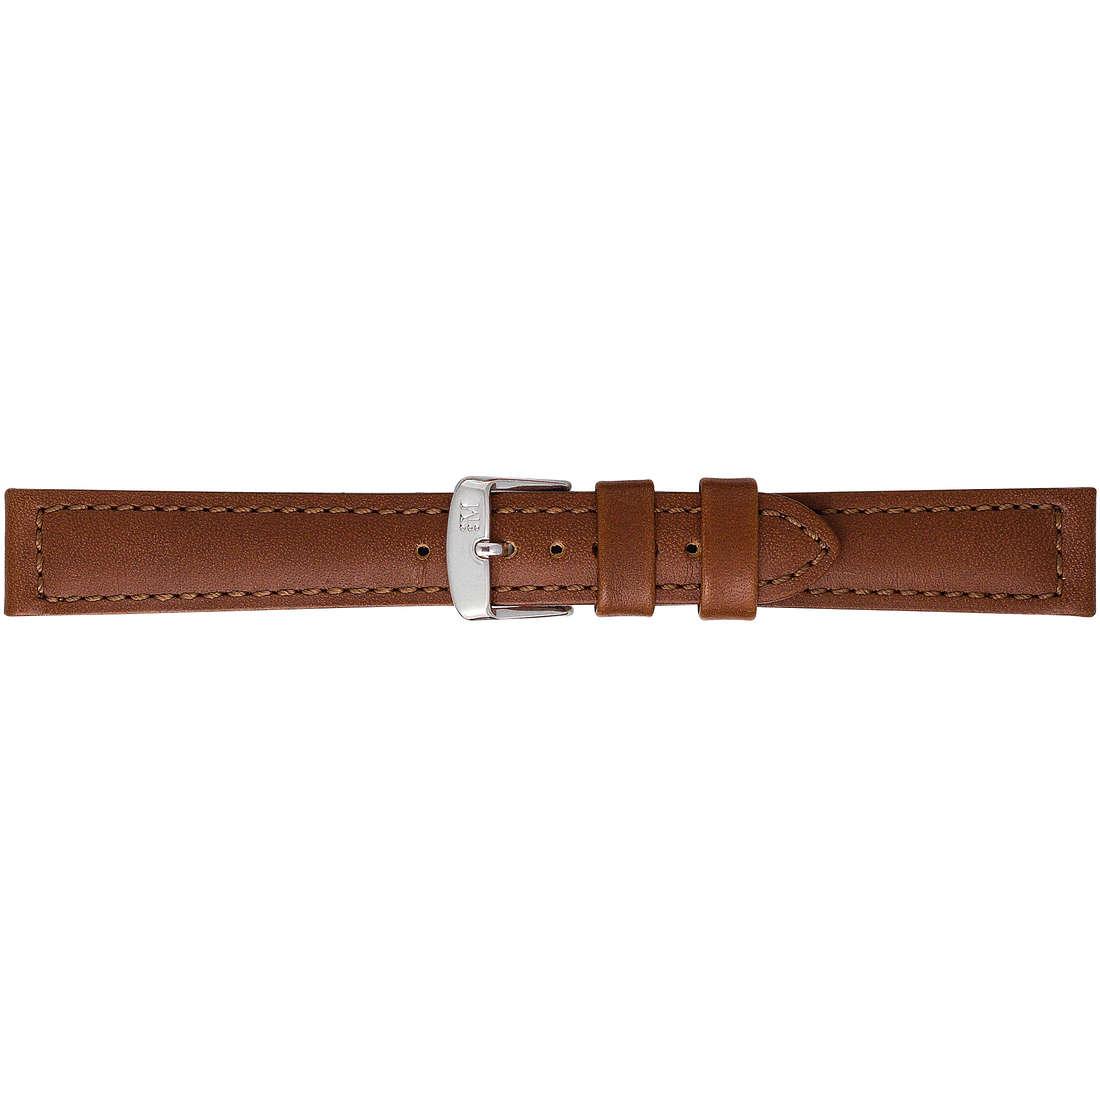 watch watch bands watch straps man Morellato Manufatti A01U2226364034CR20